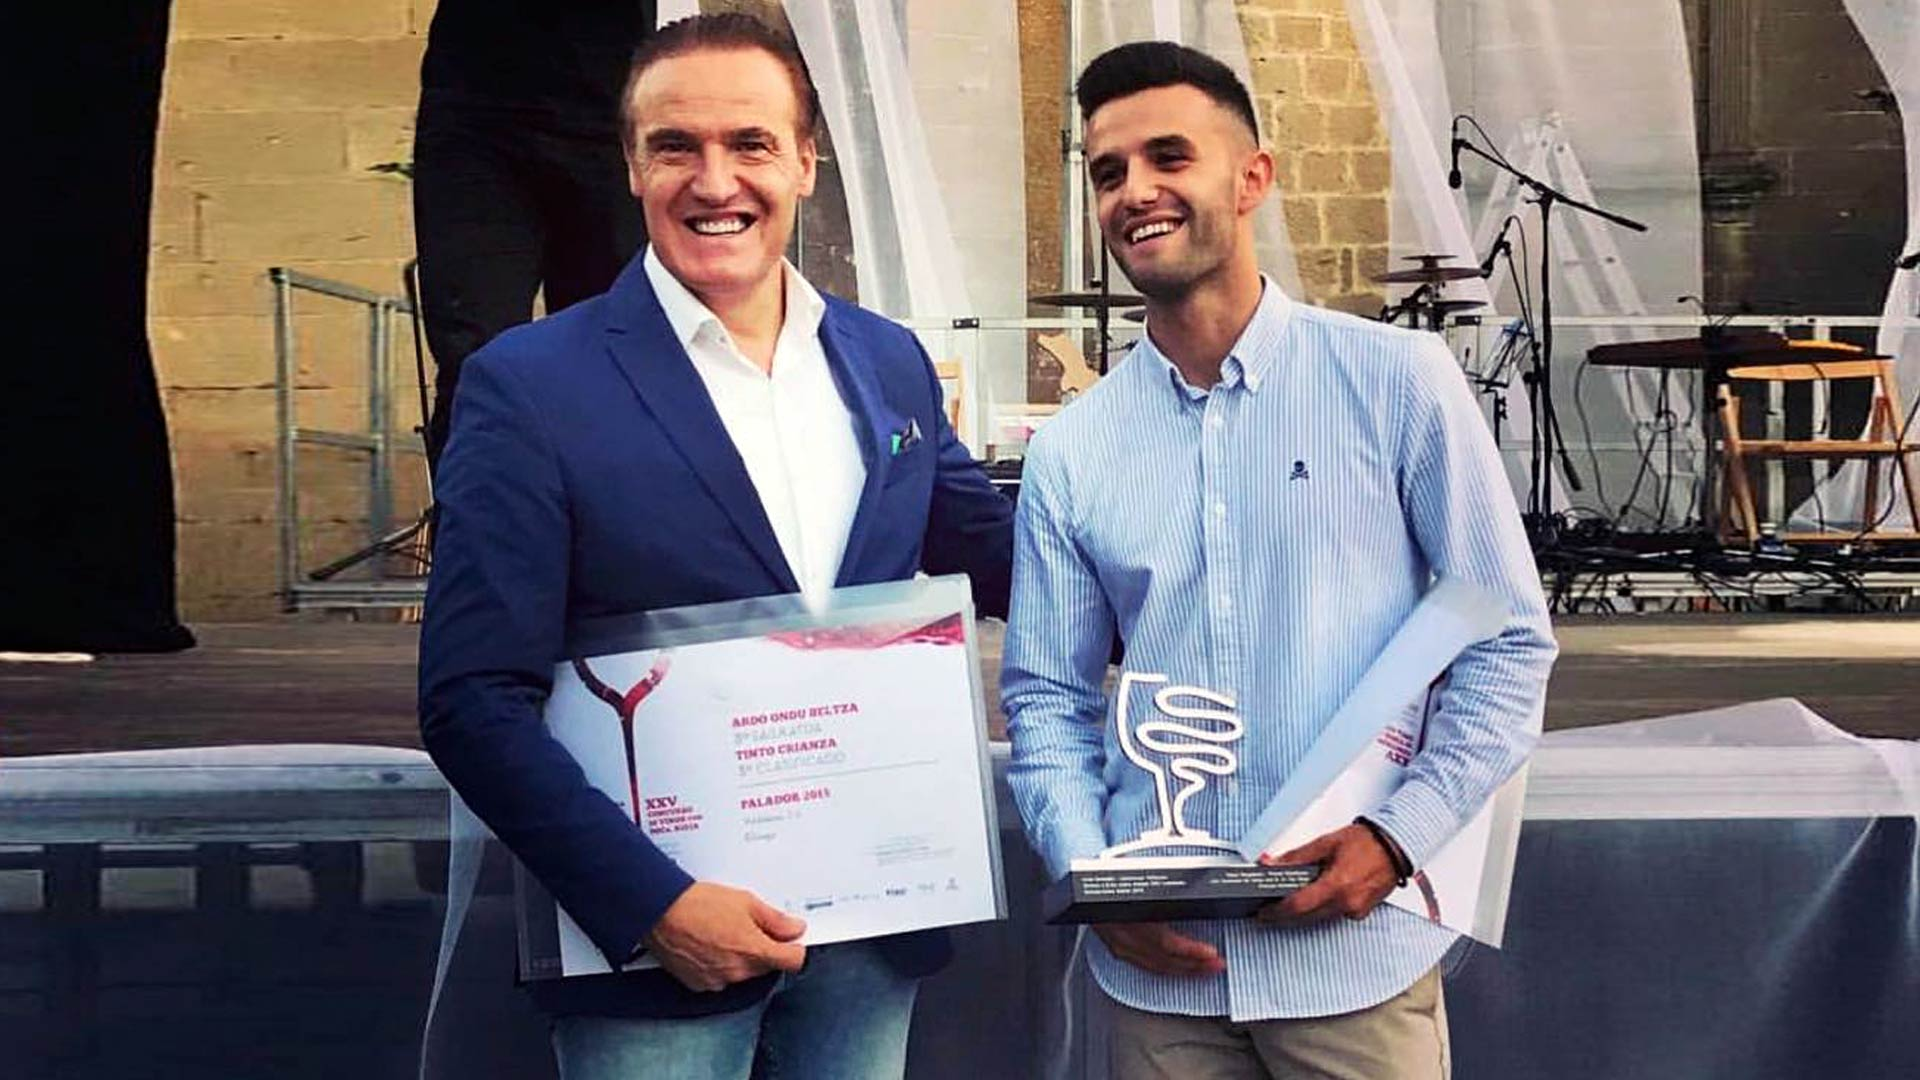 Juanje y Juan Valdelana recogen premios en la fiesta de la Vendimia de Rioja Alavesa 2018 (Elvillar)